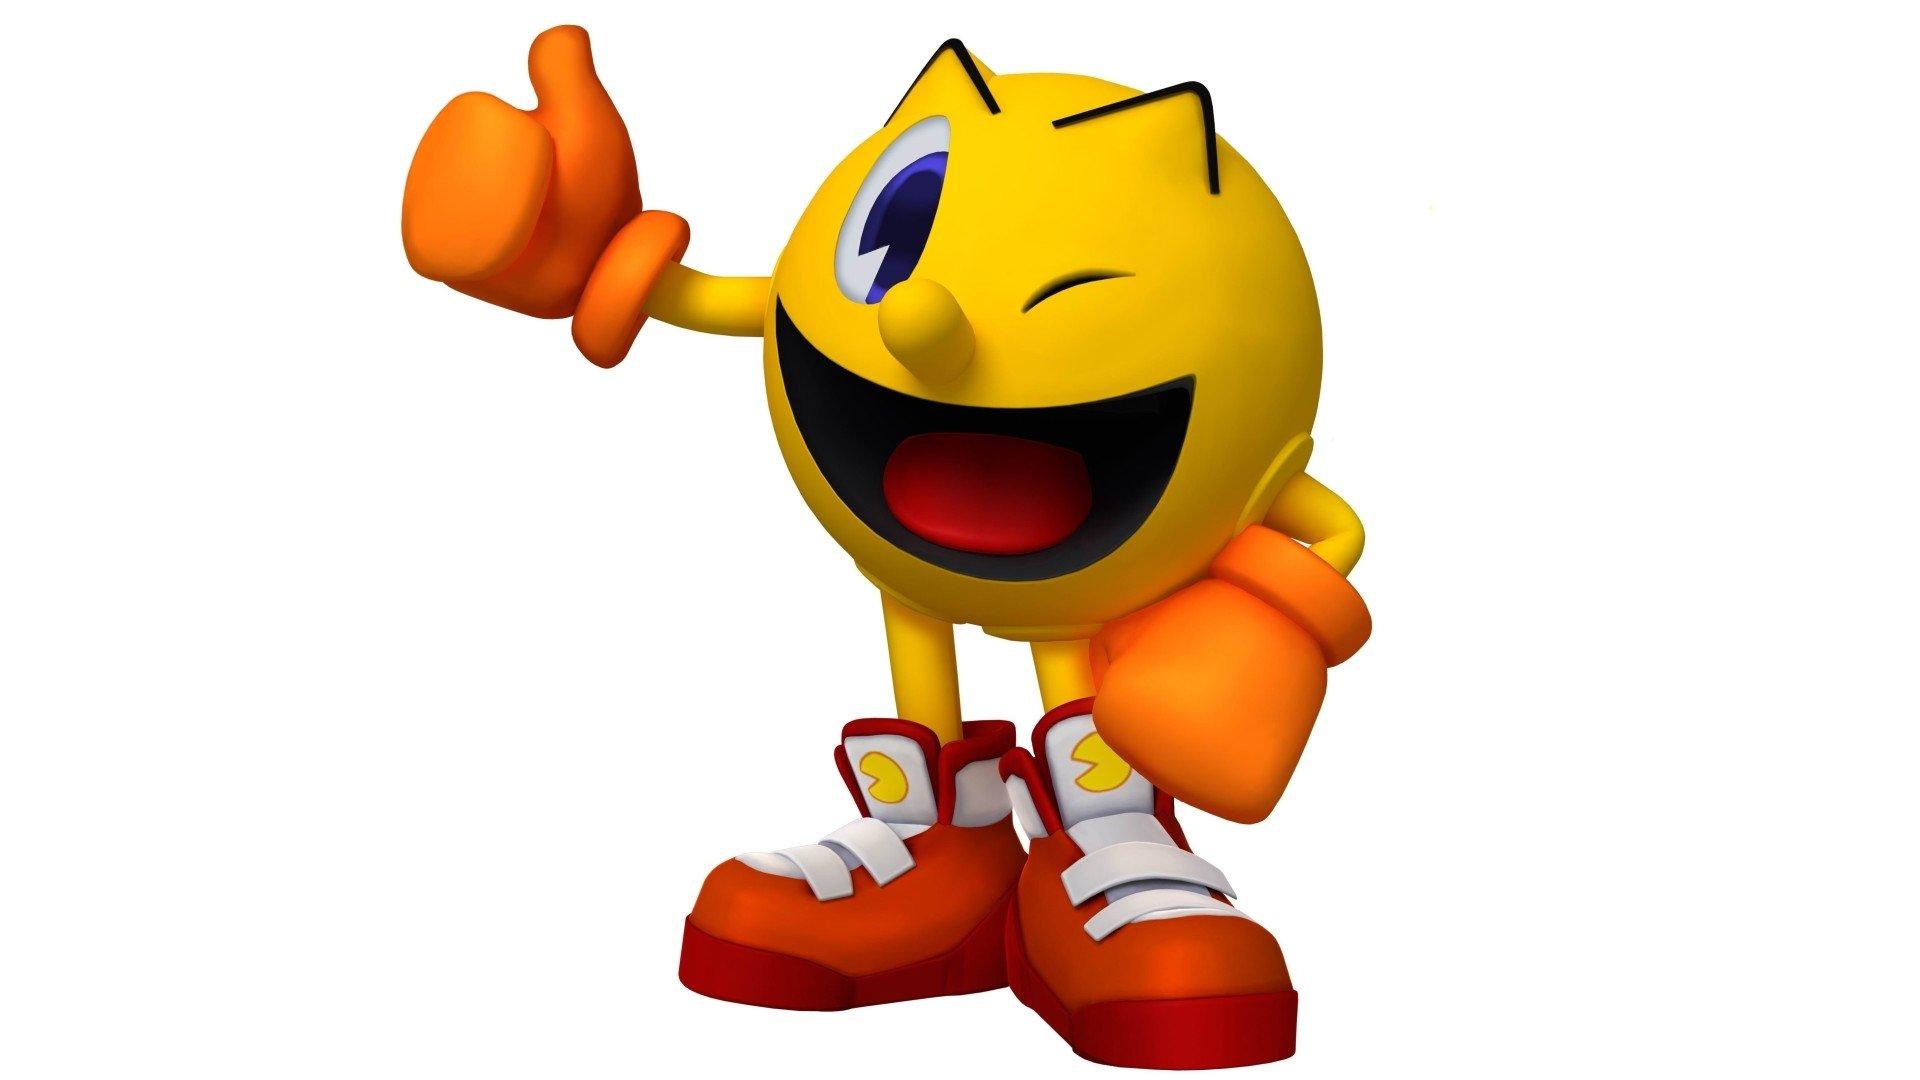 Pacman Iphone 6 Wallpaper Hd: Pac-Man 2: The New Adventures Fondo De Pantalla HD